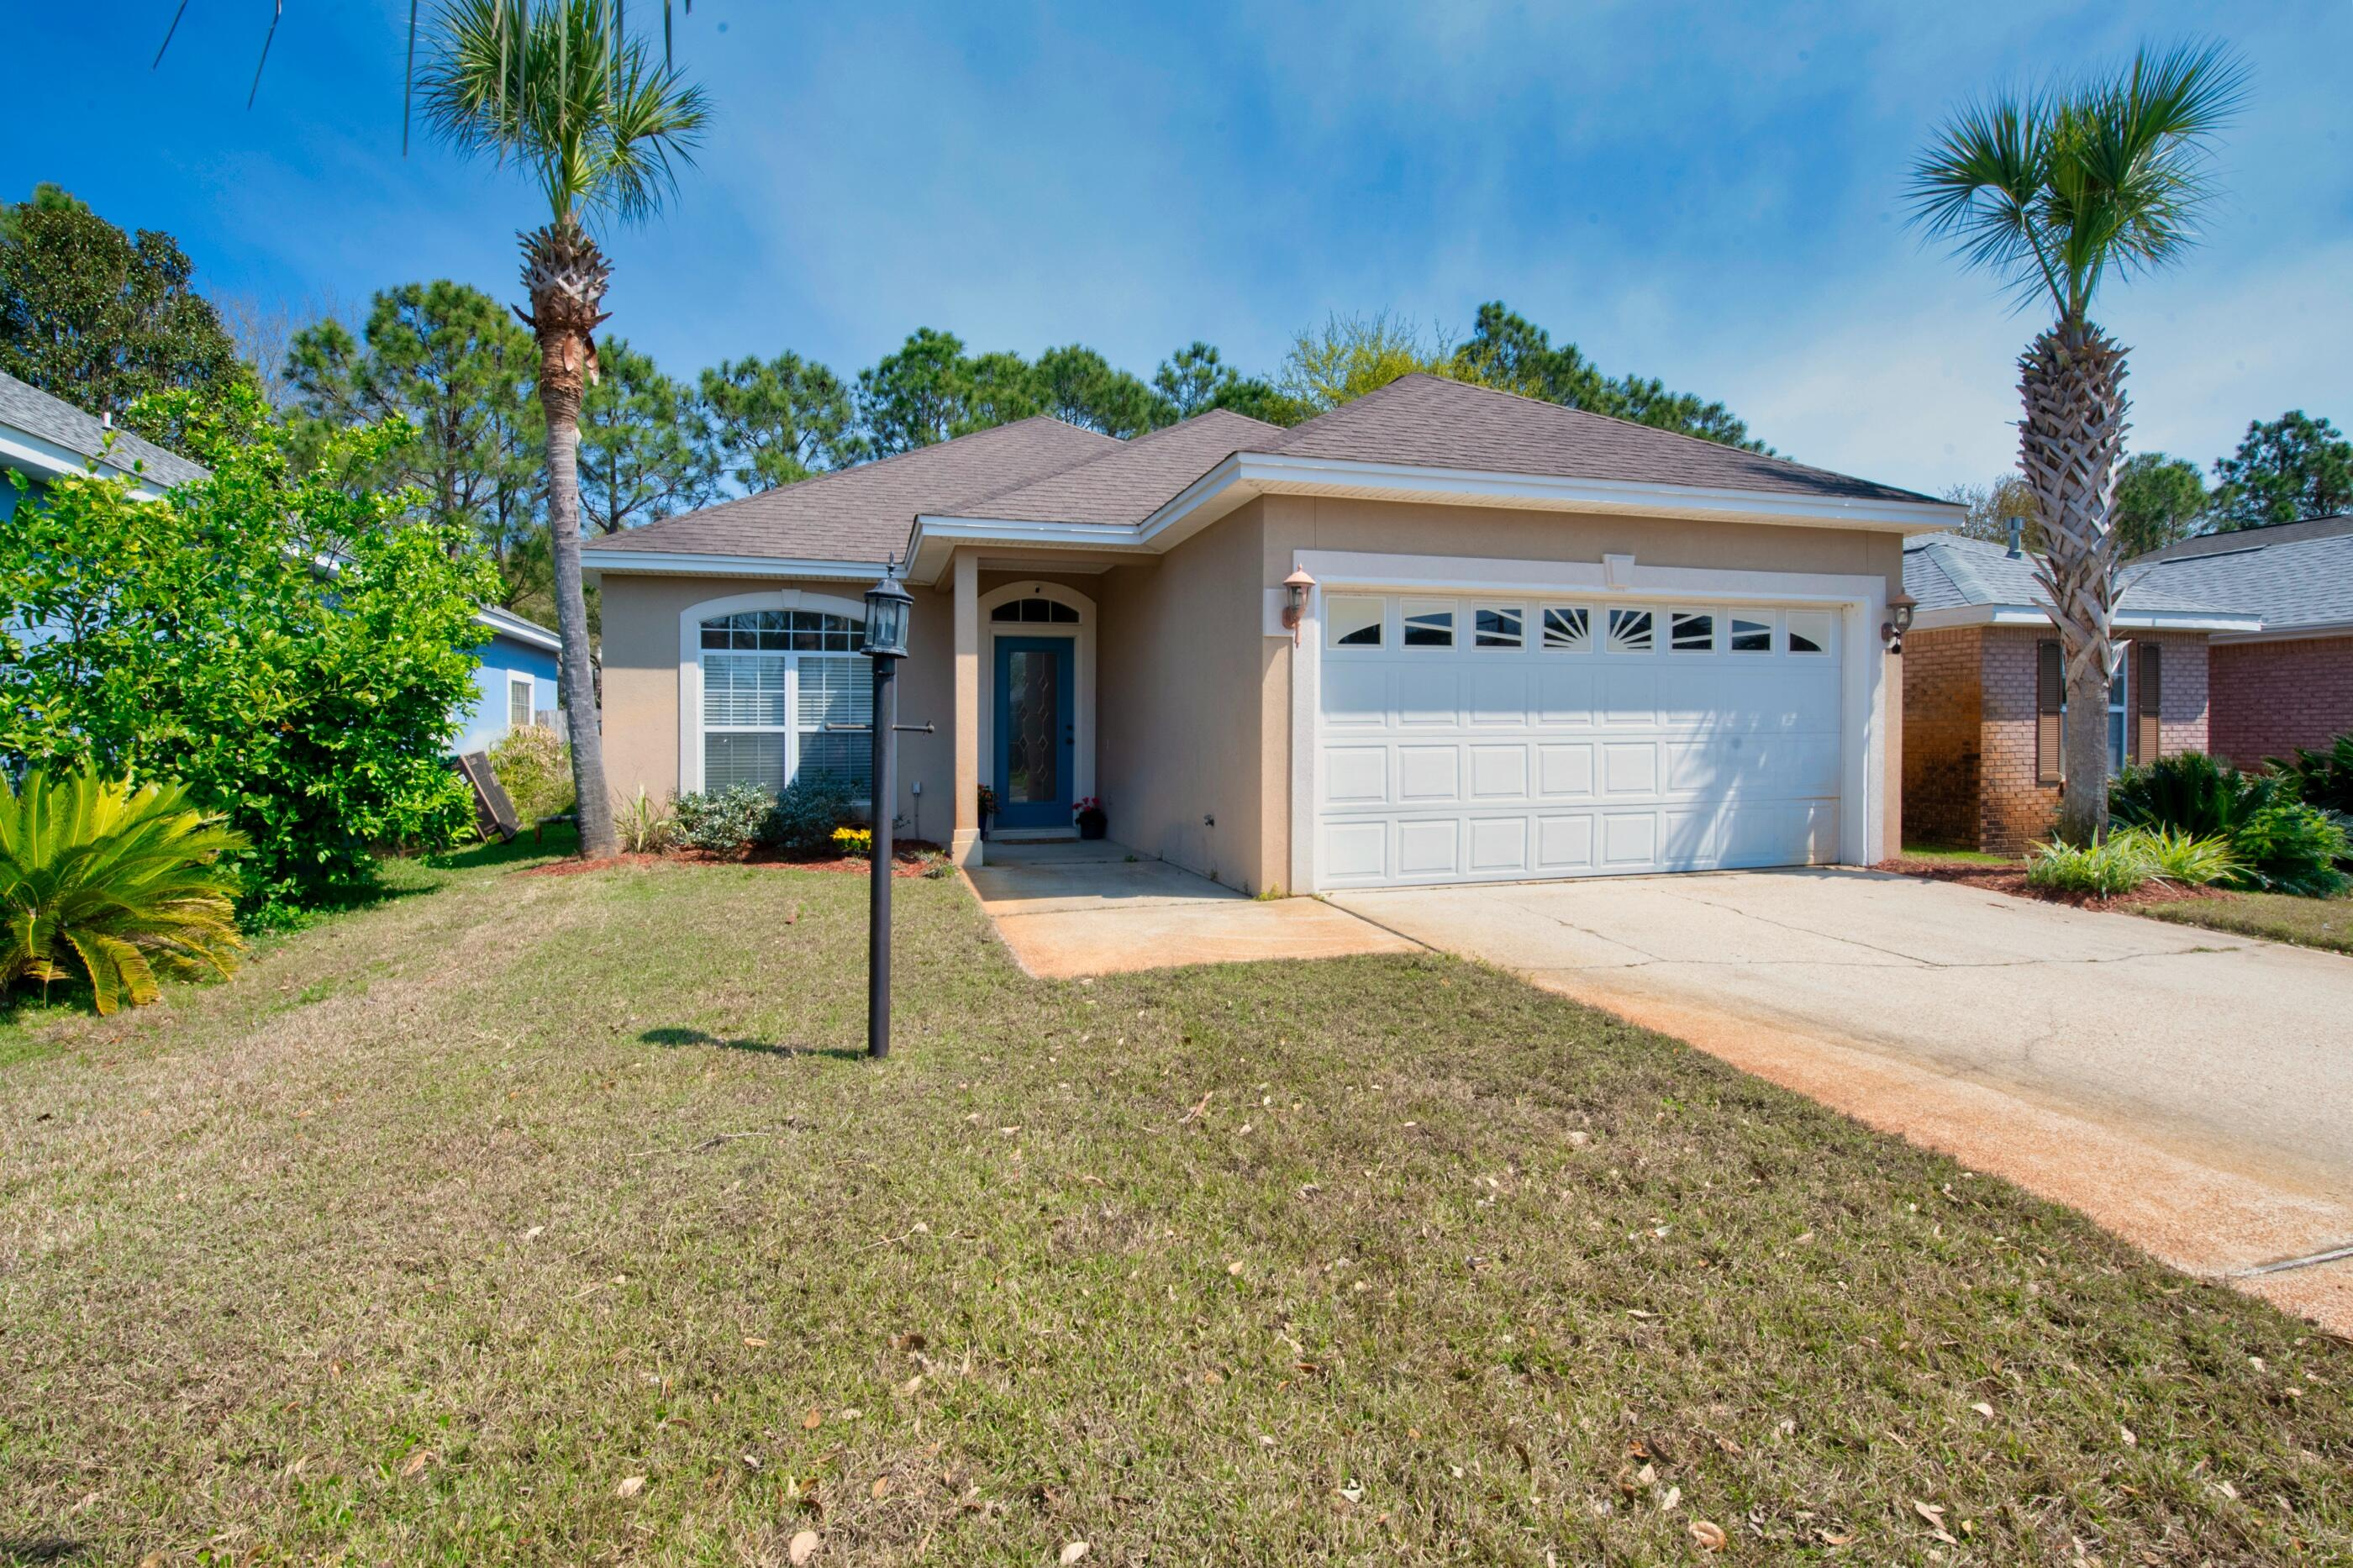 Photo of home for sale at 108 Trista Terrace, Destin FL